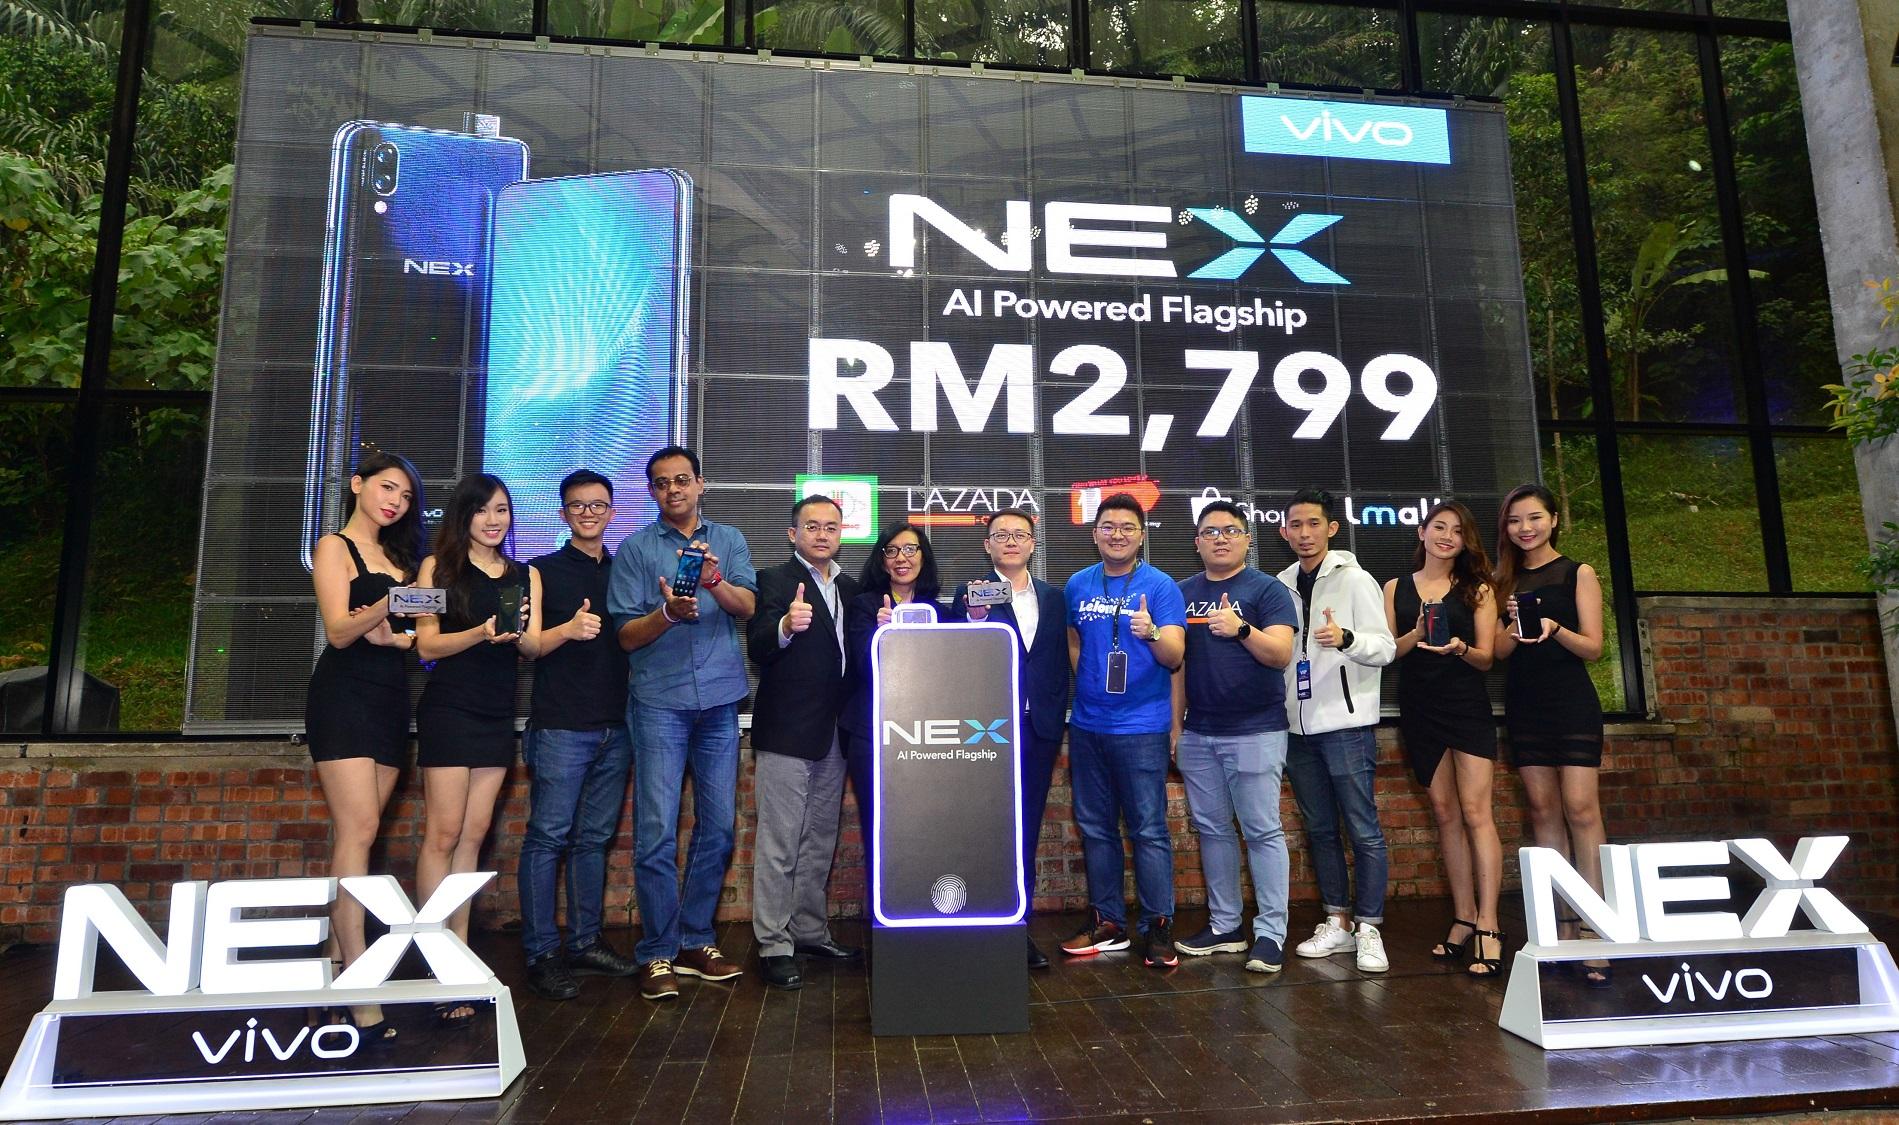 Vivo NEX Media Launch_Image 1